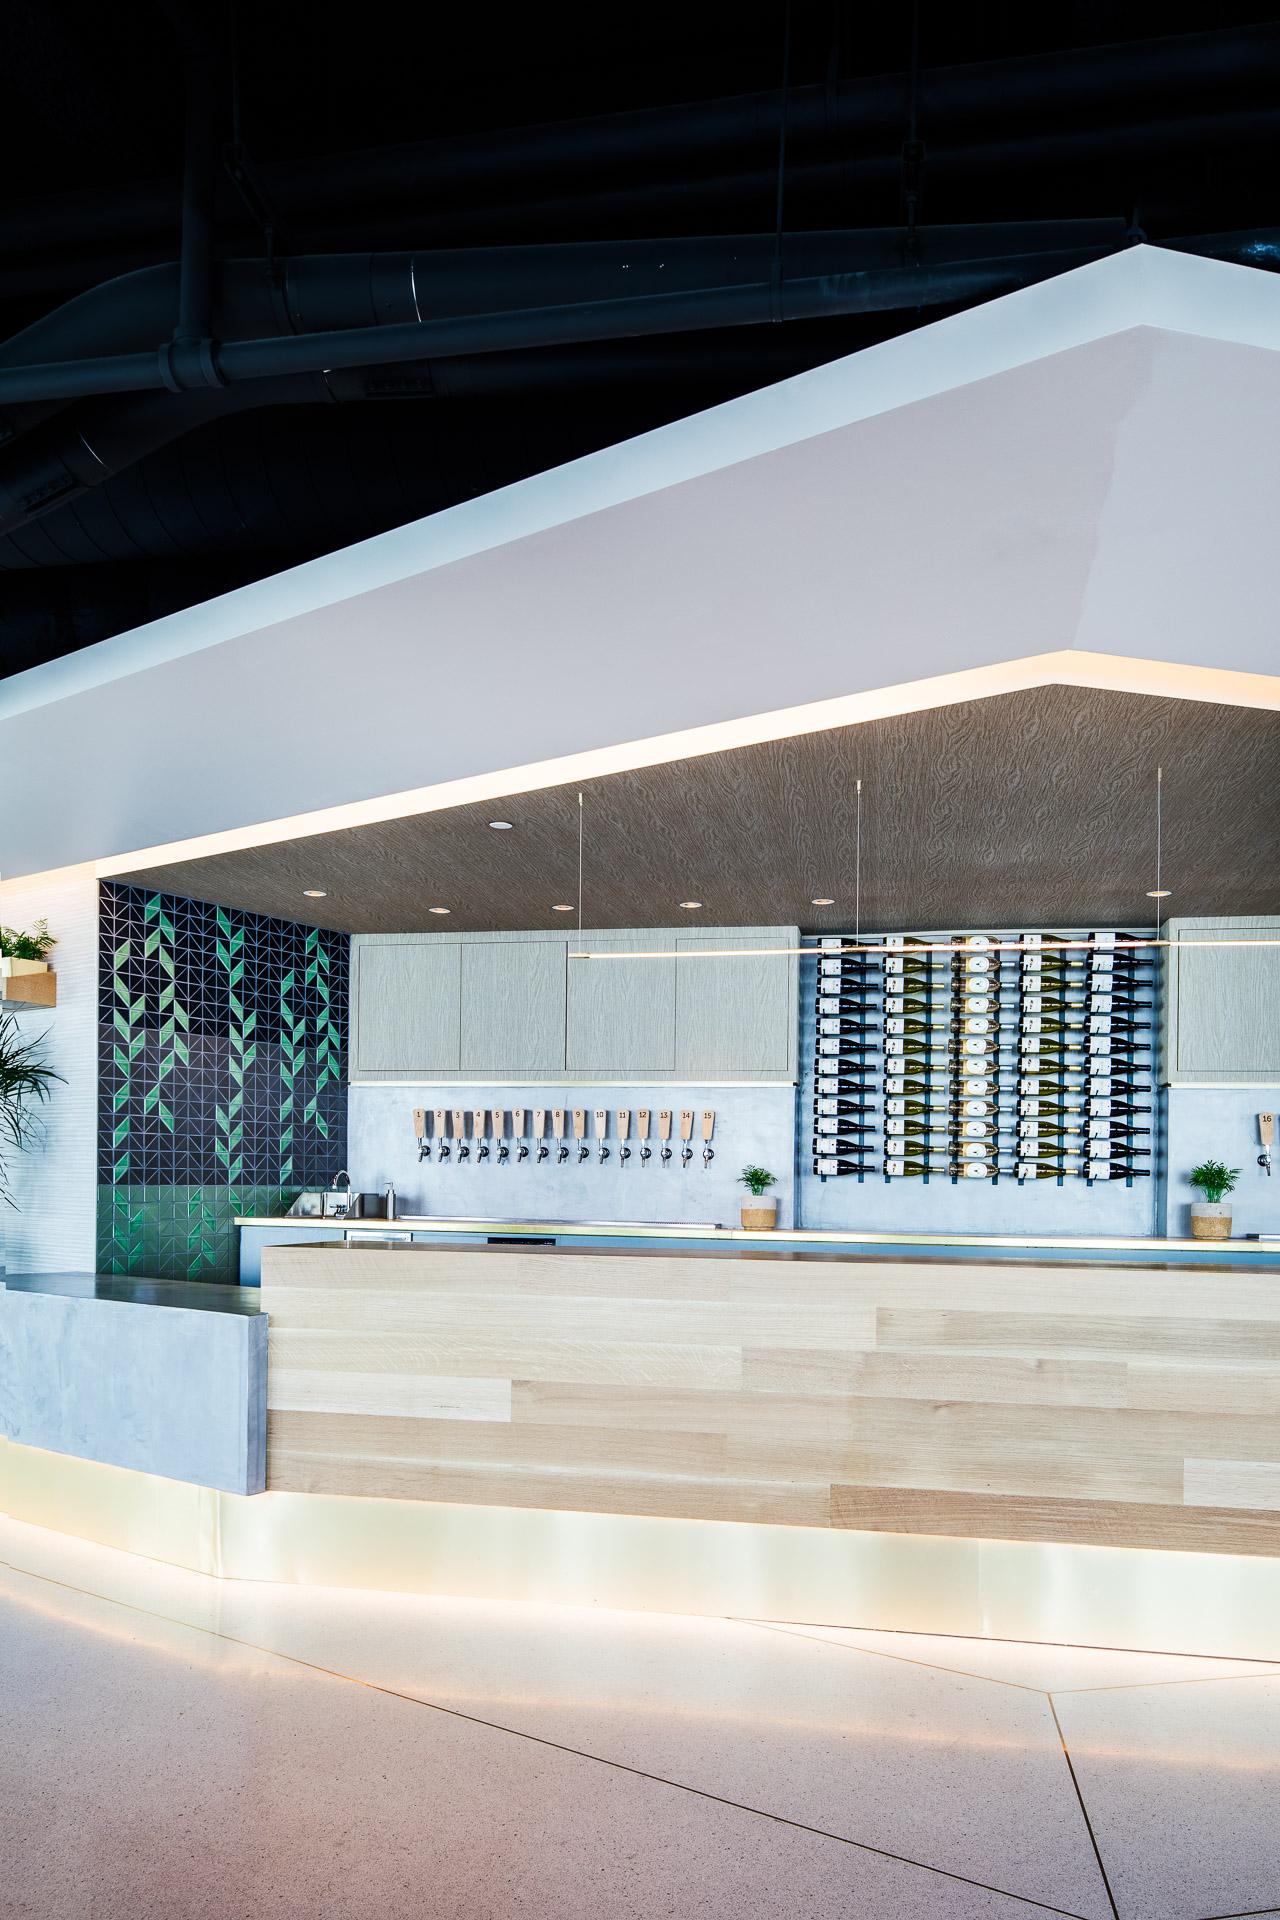 architectural-restaurant-interiors-photographer-los-angeles-oue-skyspace-dtla-15.jpg